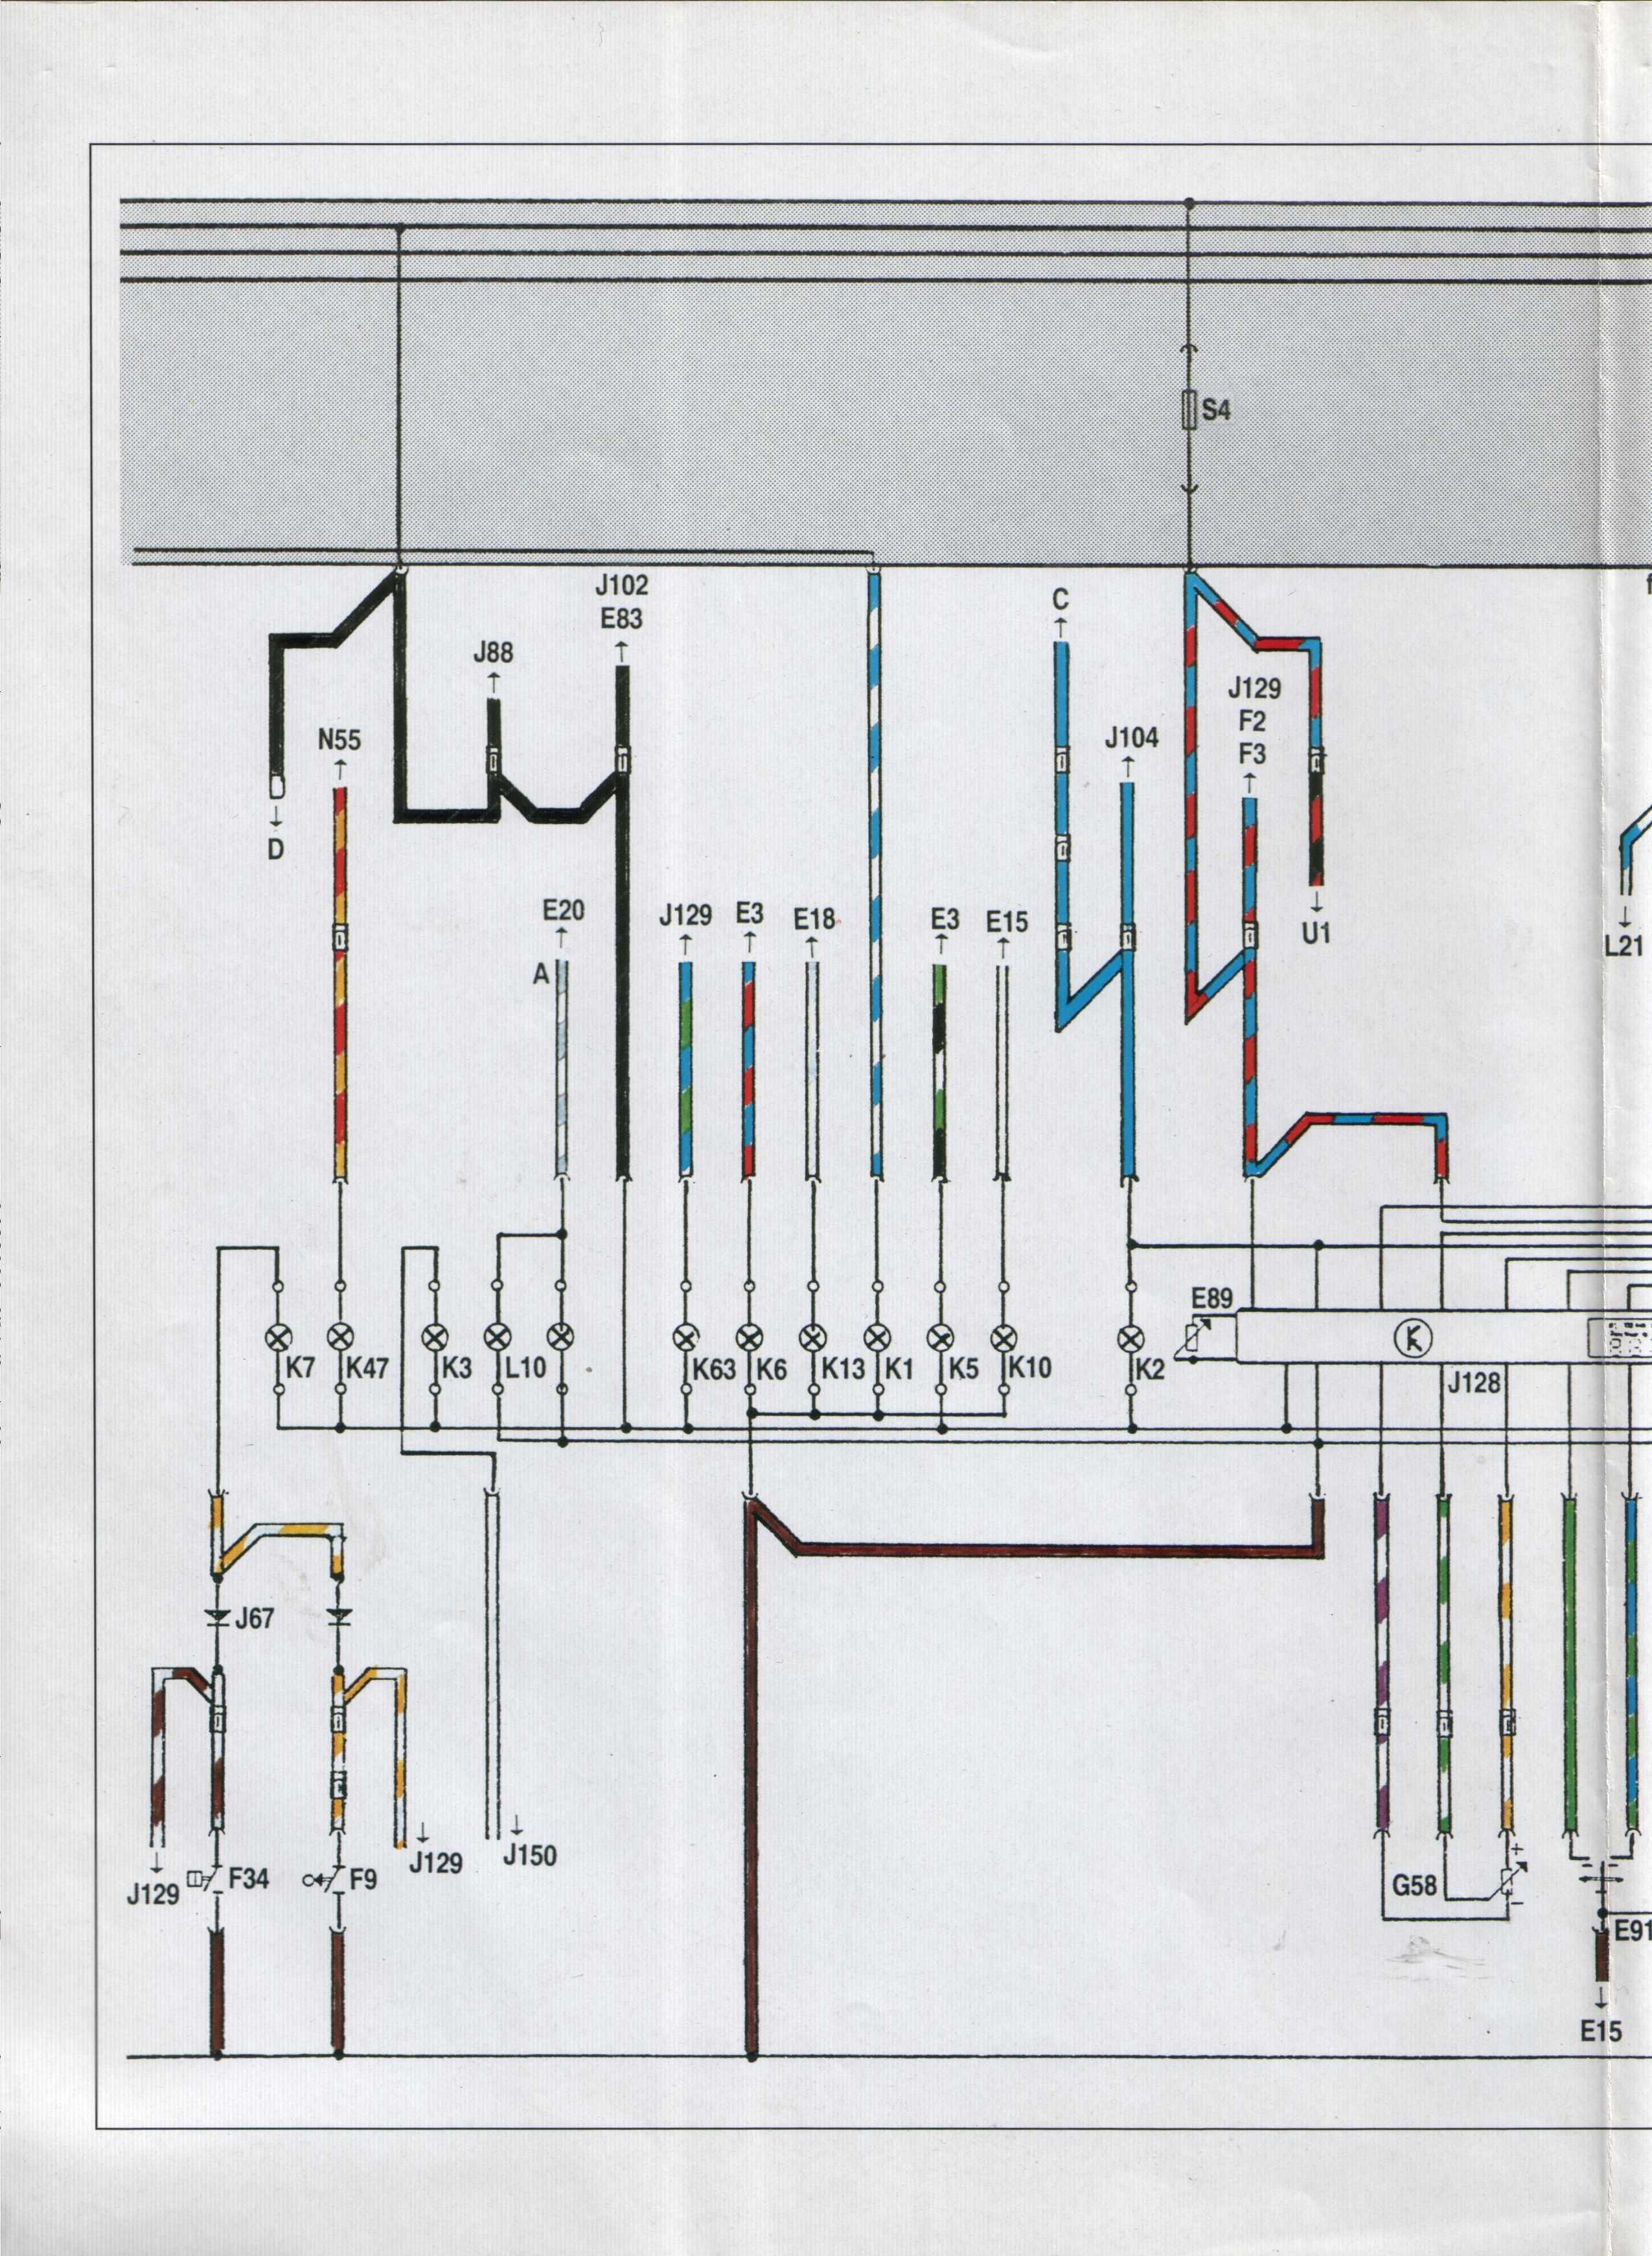 e3 vss wiring diagrams circuit diagram symbols u2022 rh blogospheree com GM VSS Wiring-Diagram Hot Rod Wiring Diagram